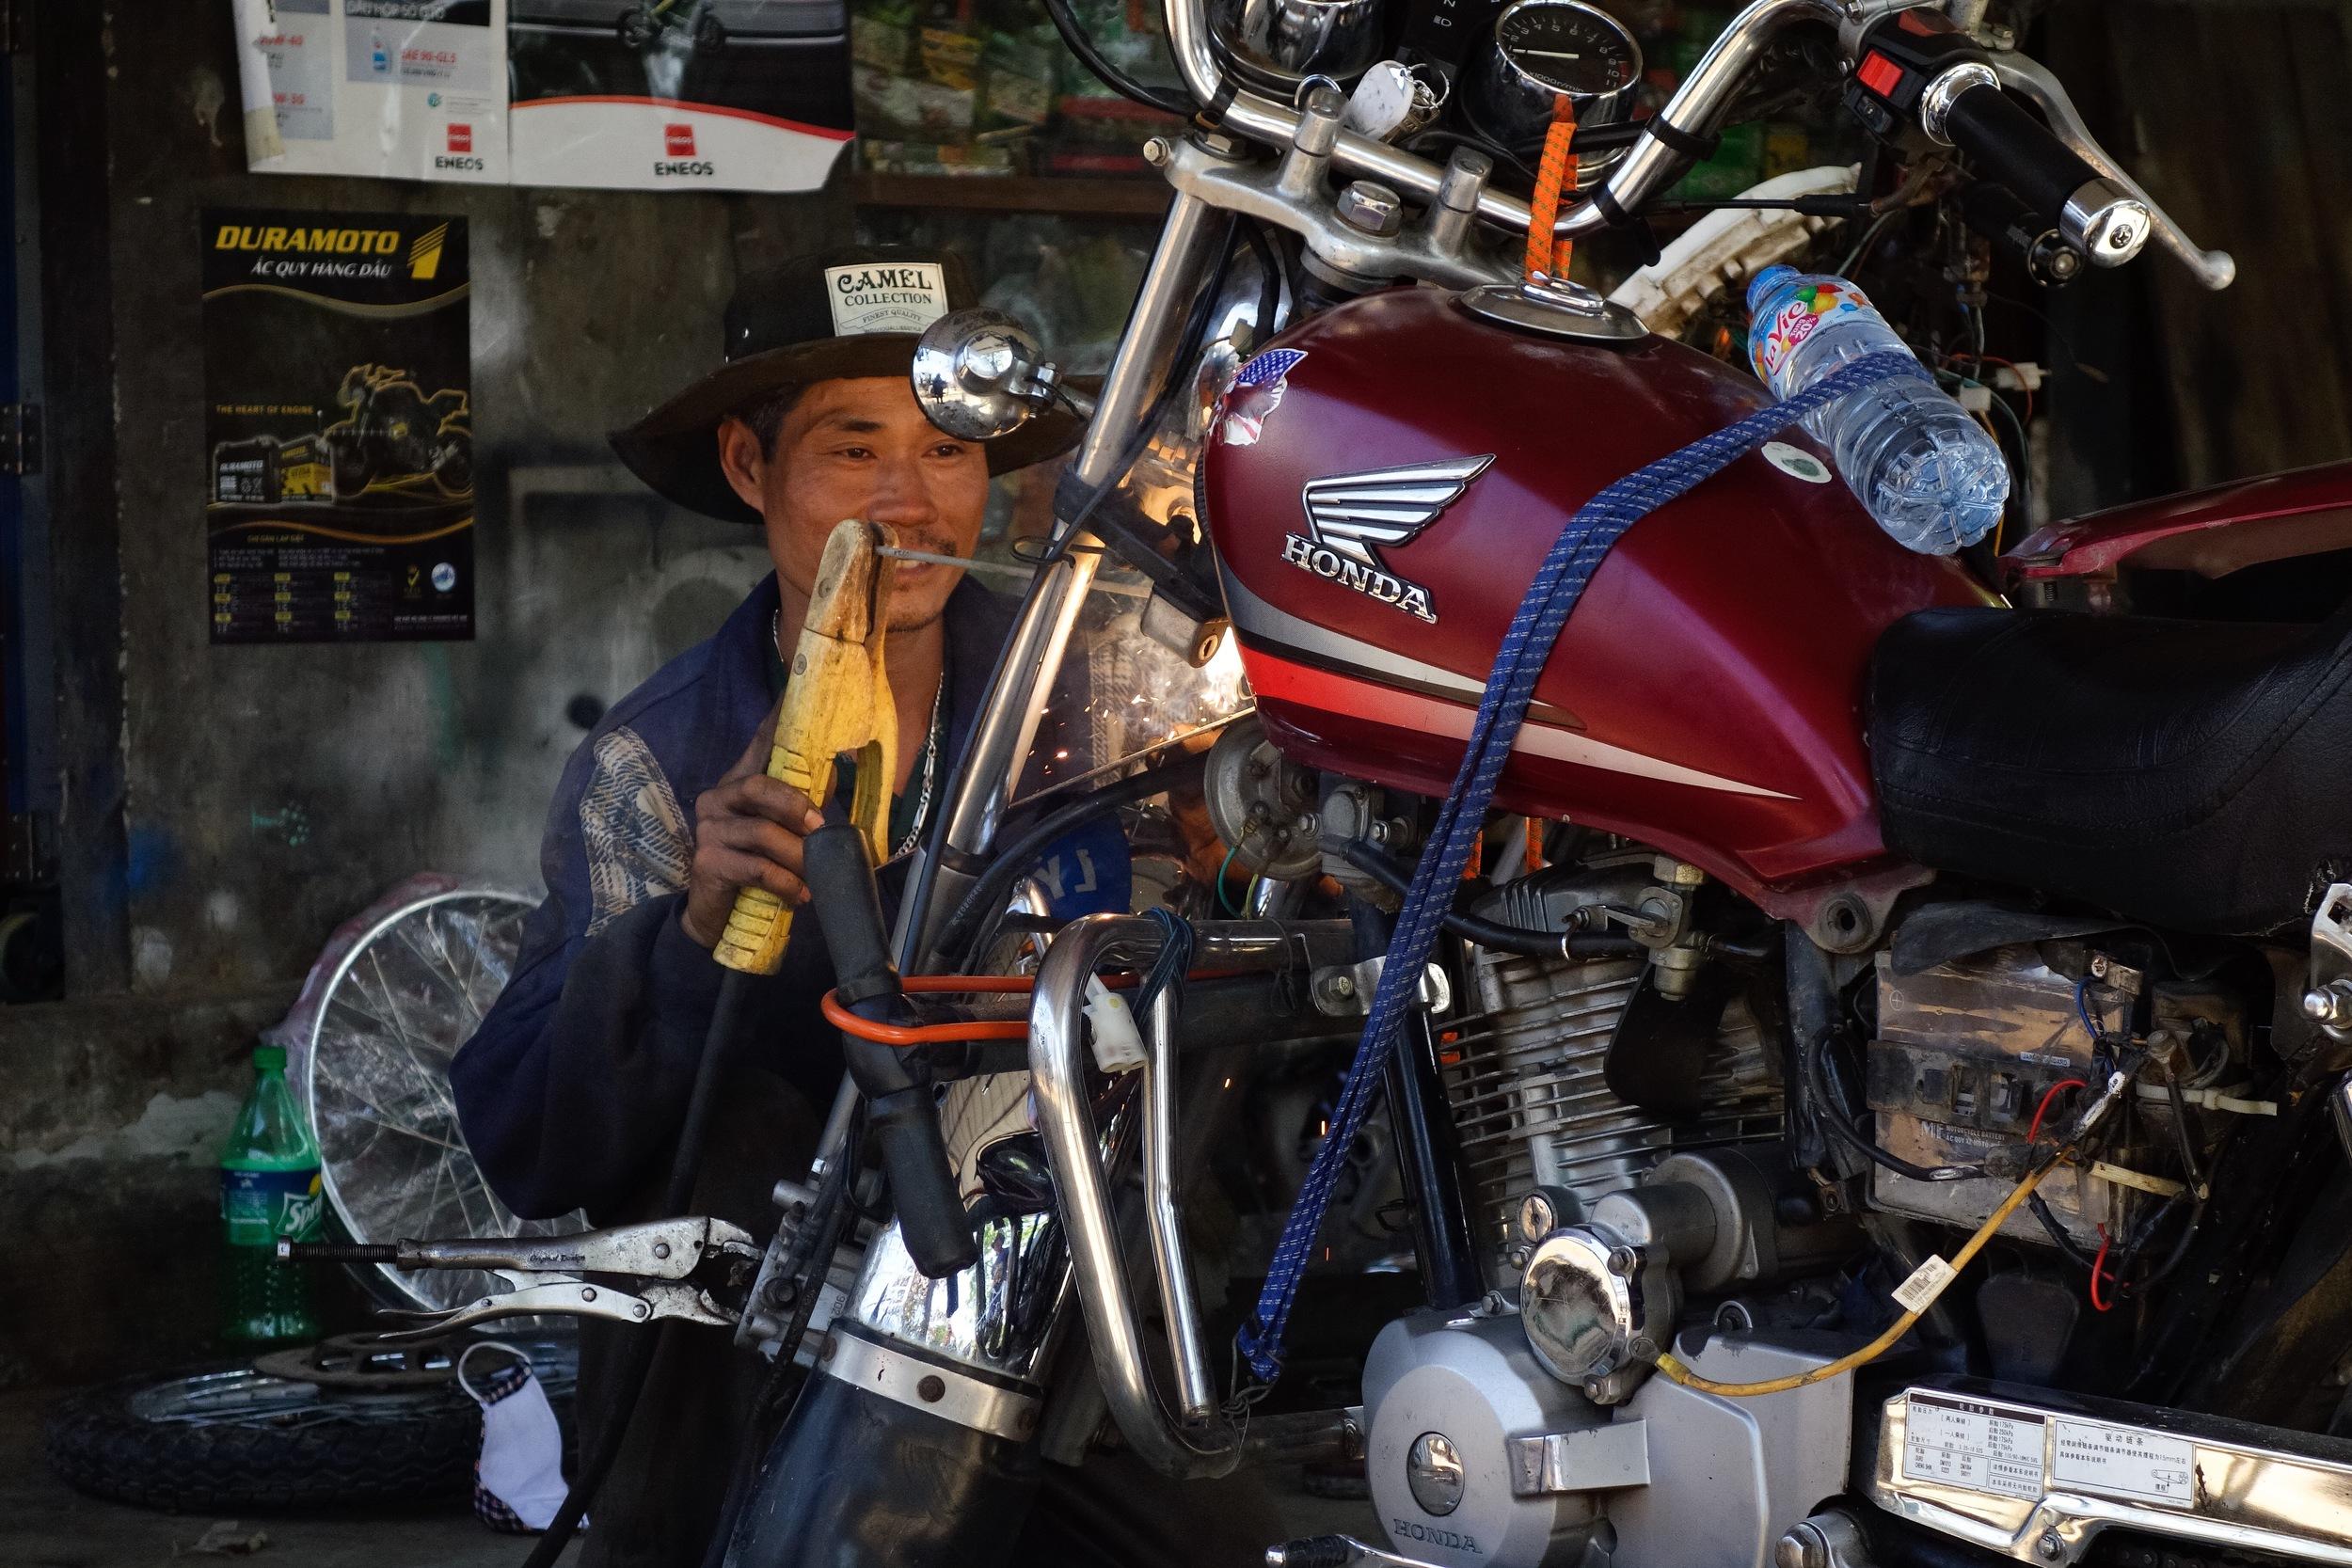 A Vietnamese mechanic welding the headlight on a Motorcycle